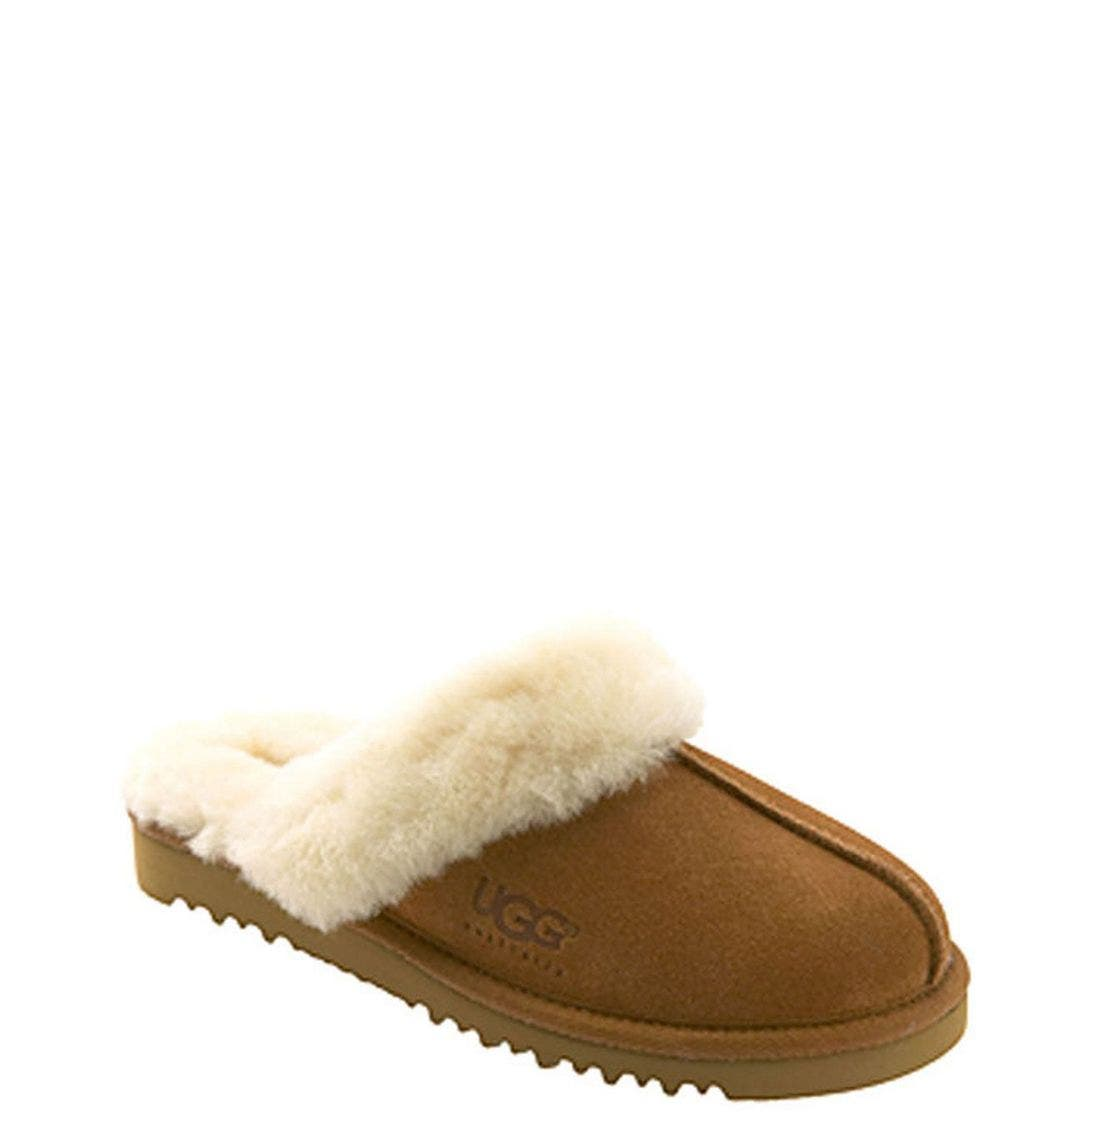 Main Image - UGG® Cozy Scuff Slipper (Toddler, Little Kid & Big Kid)